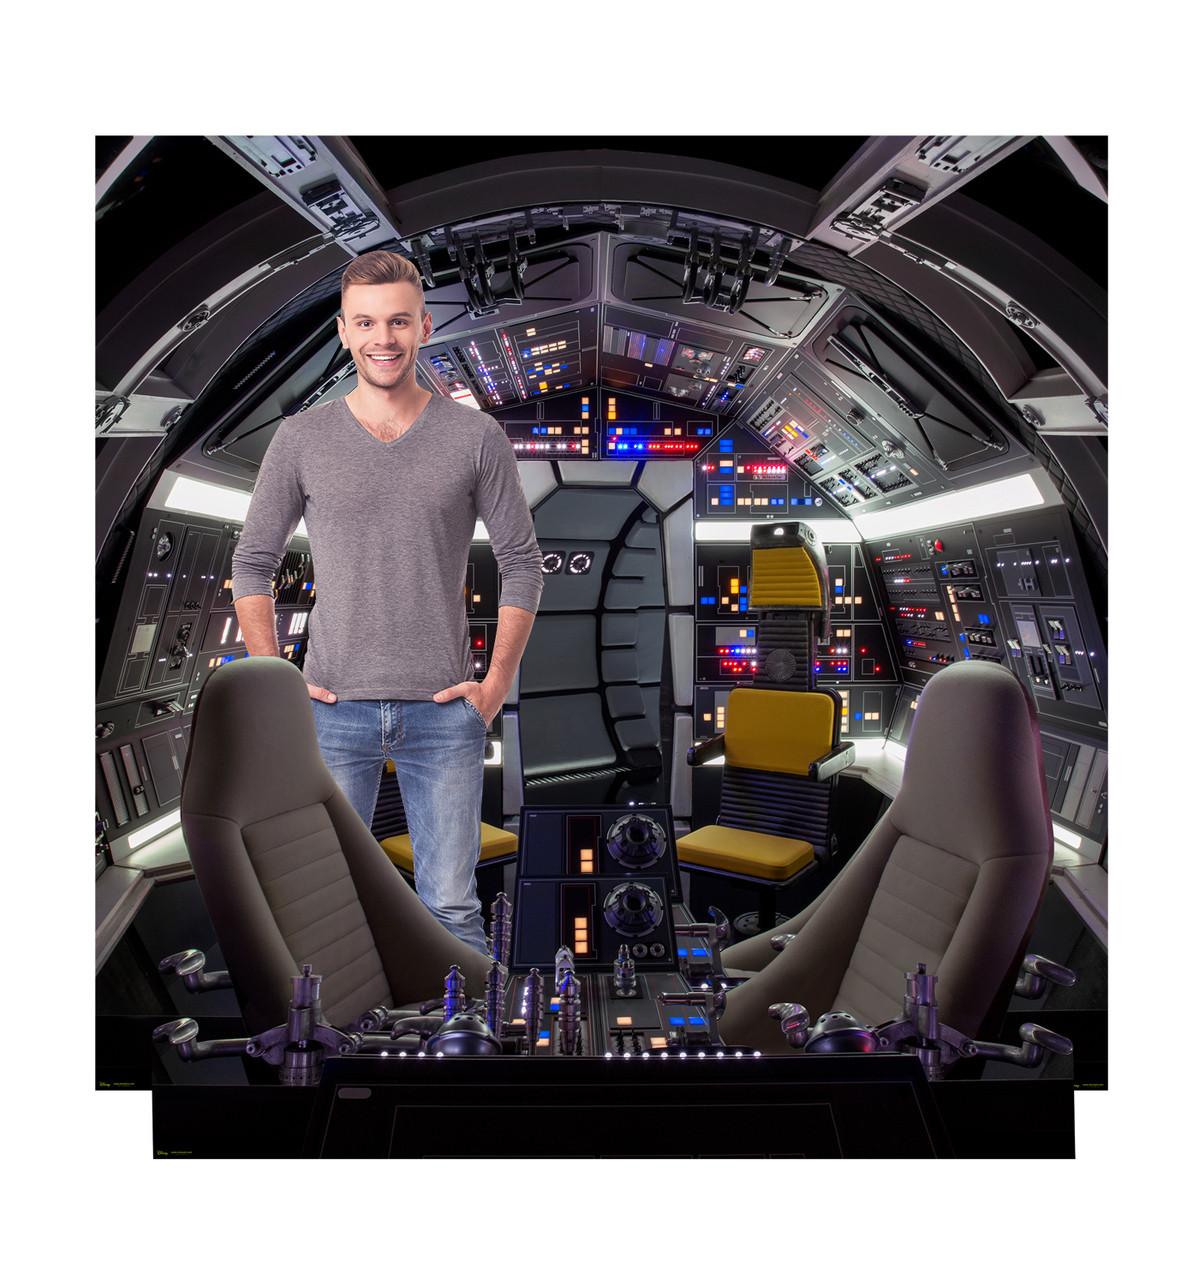 Cockpit of Millennium Falcon Cardboard Backdrop™  SKU 2664